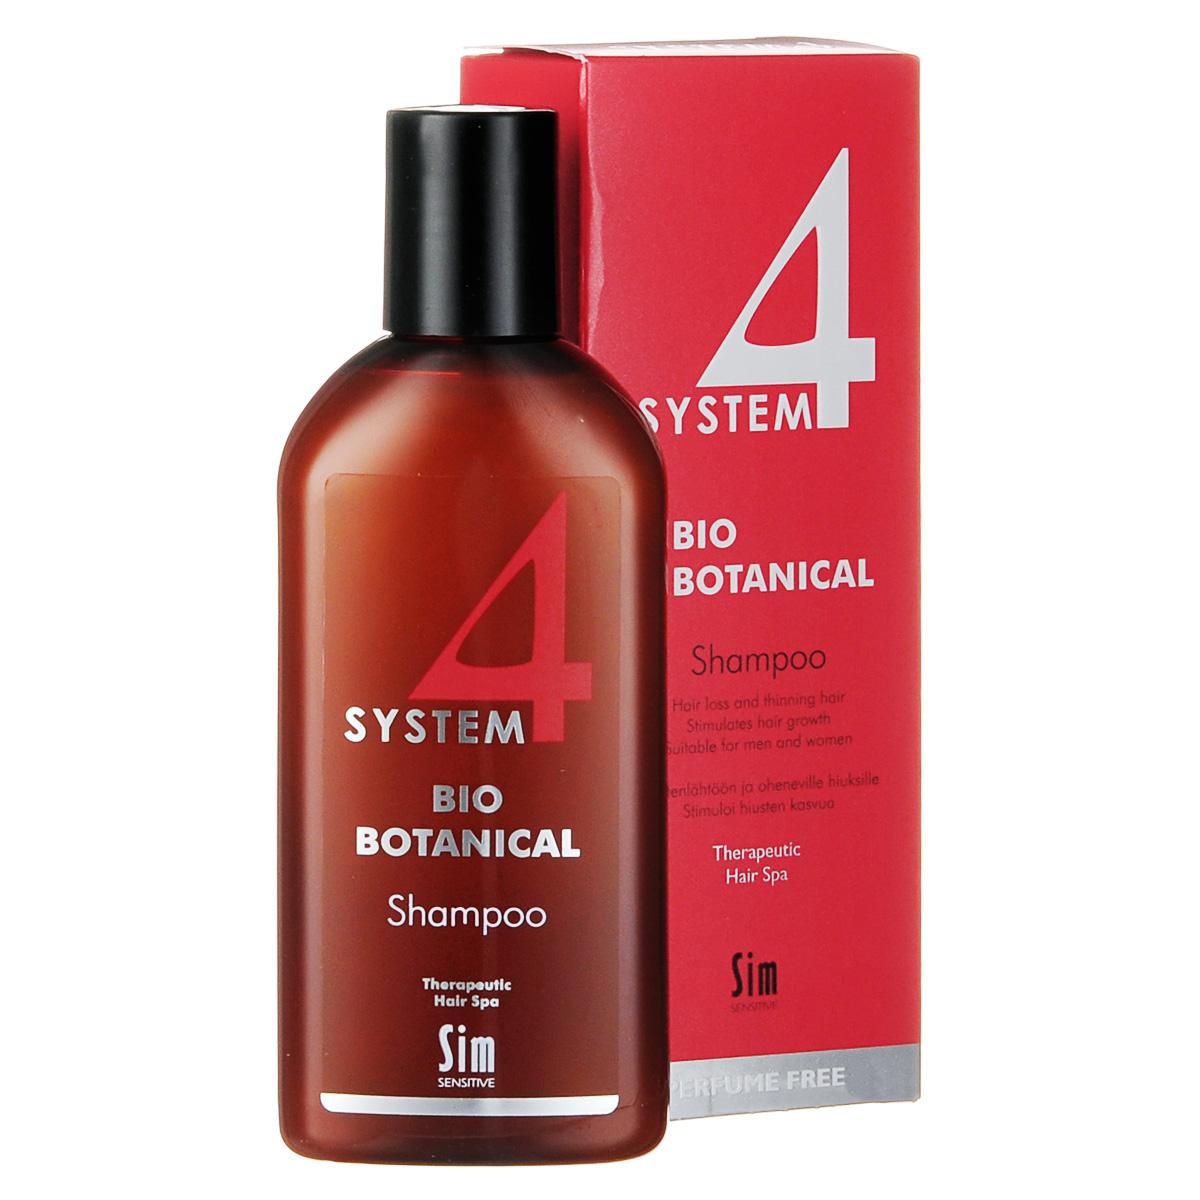 SIM SENSITIVE Био Ботанический Шампунь SYSTEM 4 Bio Botanical Shampoo Био, 215мл5320